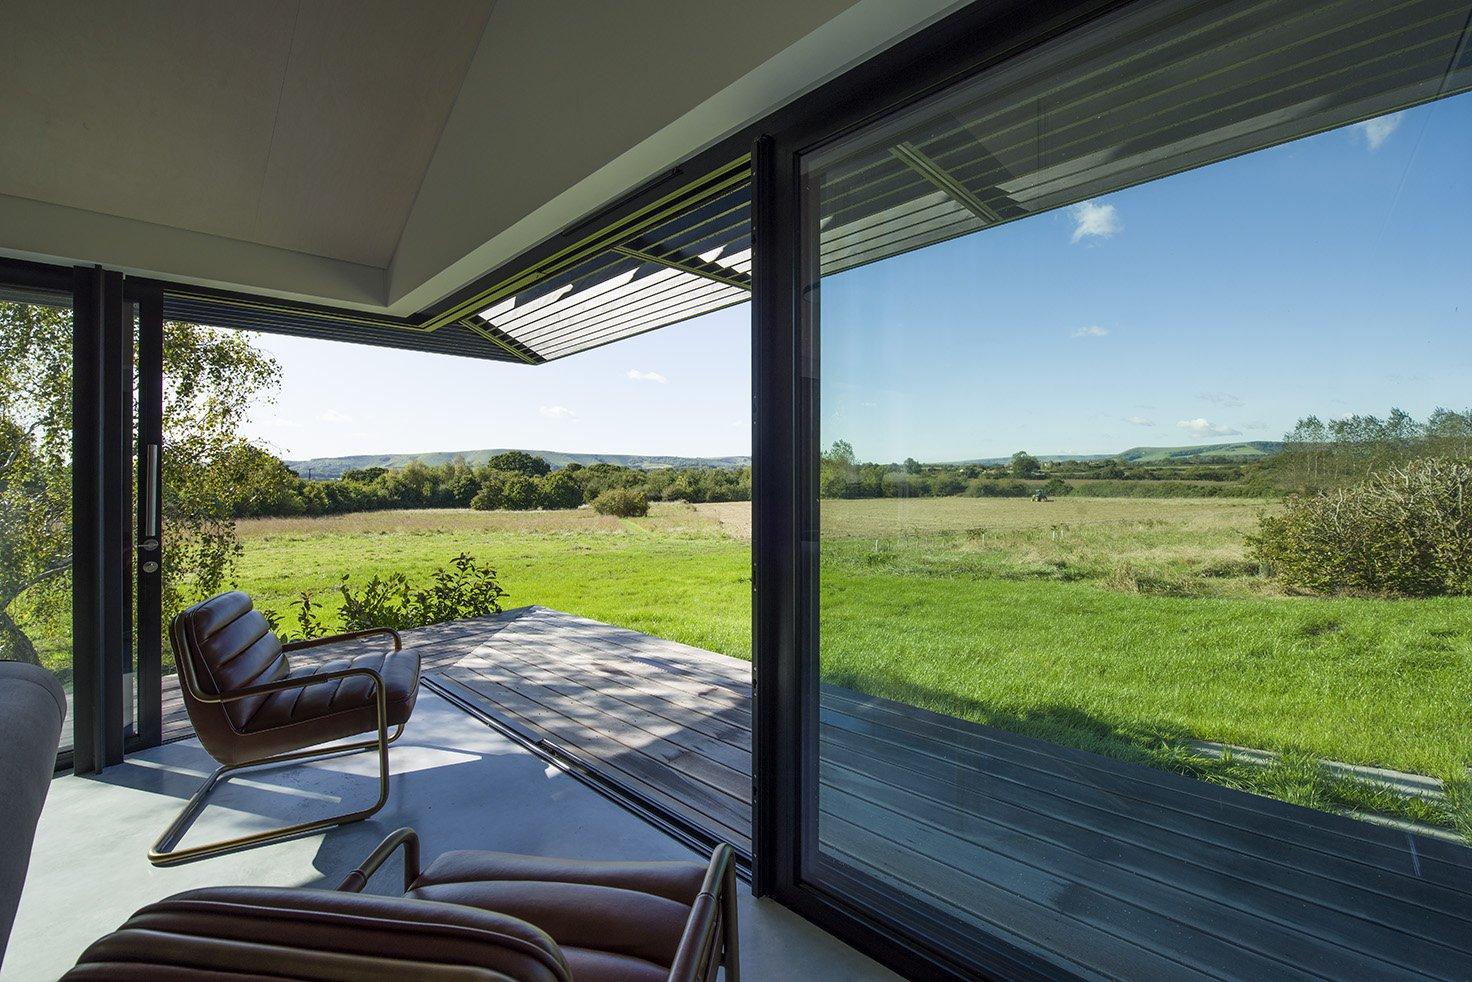 Sunflex SVG20 Sliding Door in country home